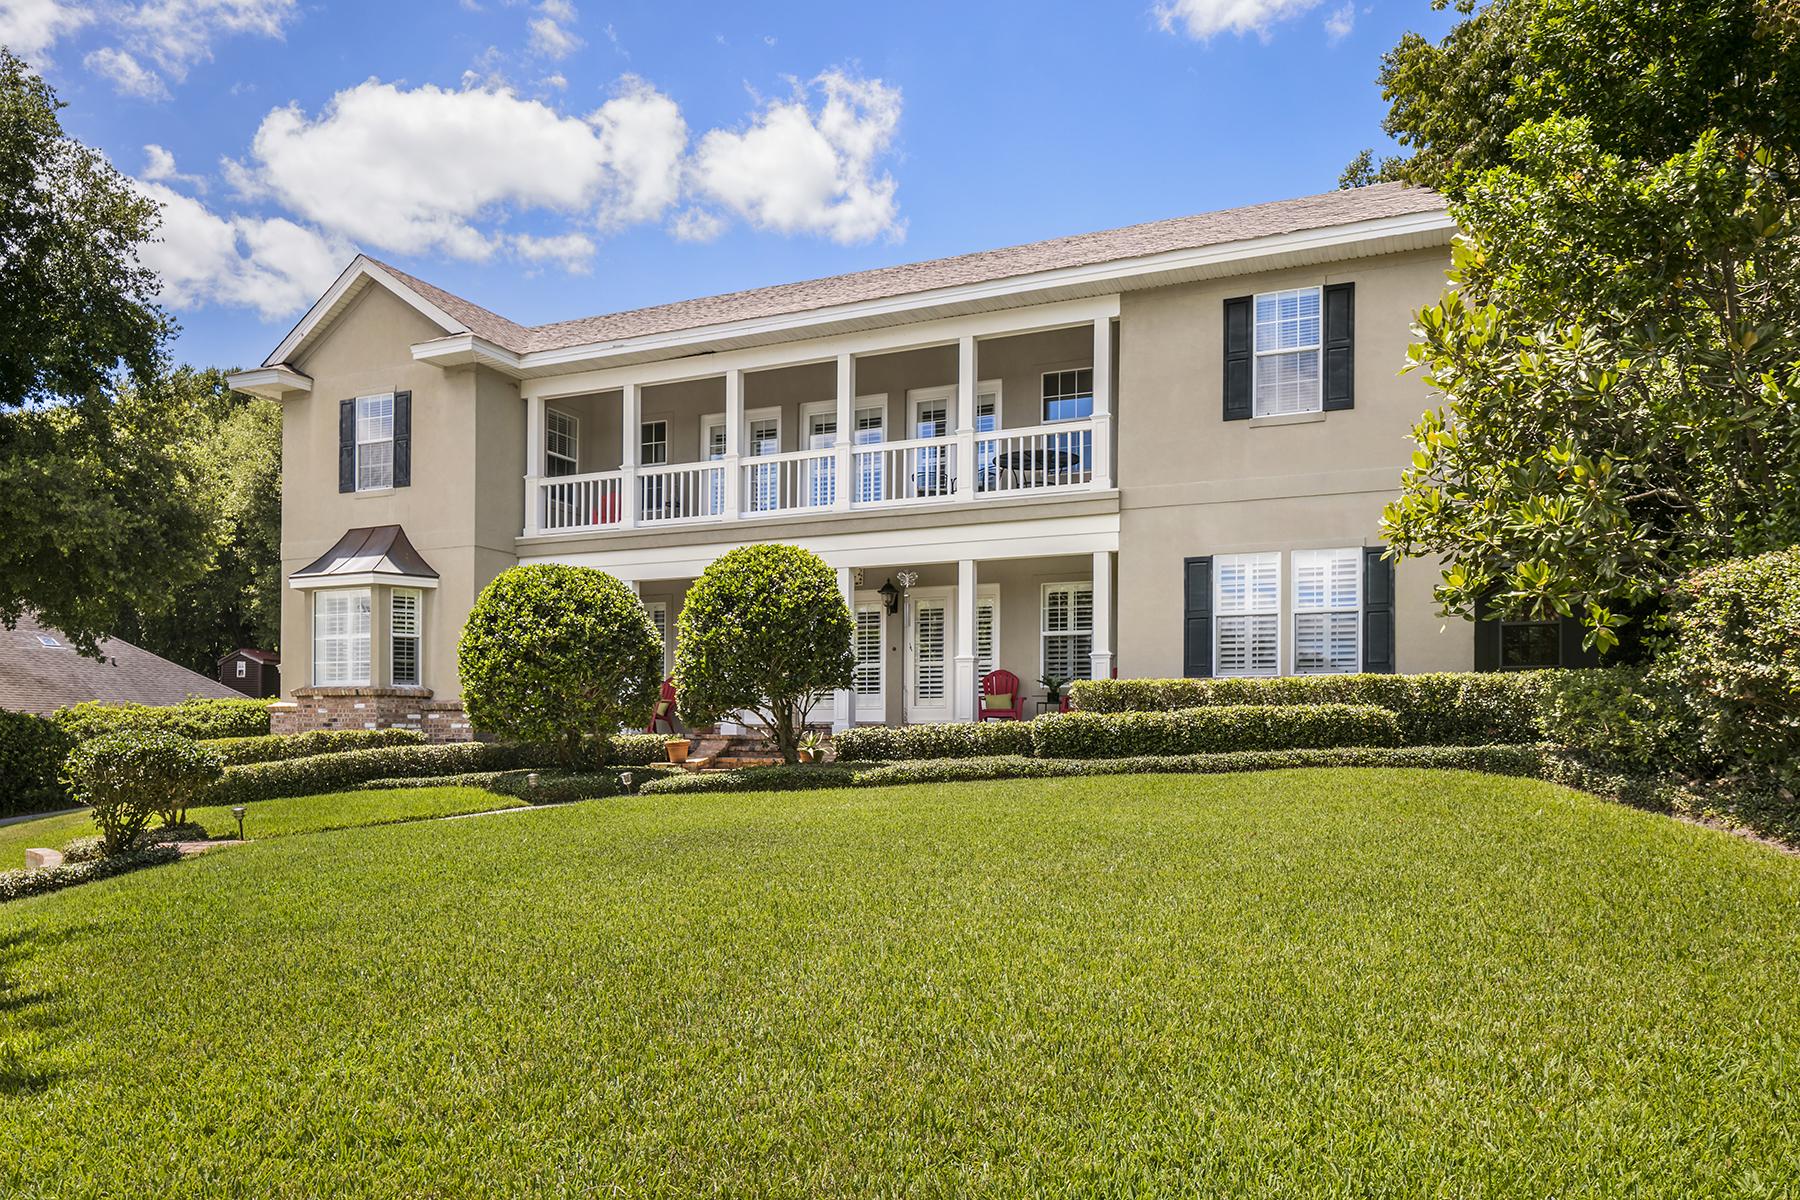 Single Family Home for Sale at EUSTIS 1504 Fahnstock St Eustis, Florida, 32726 United States